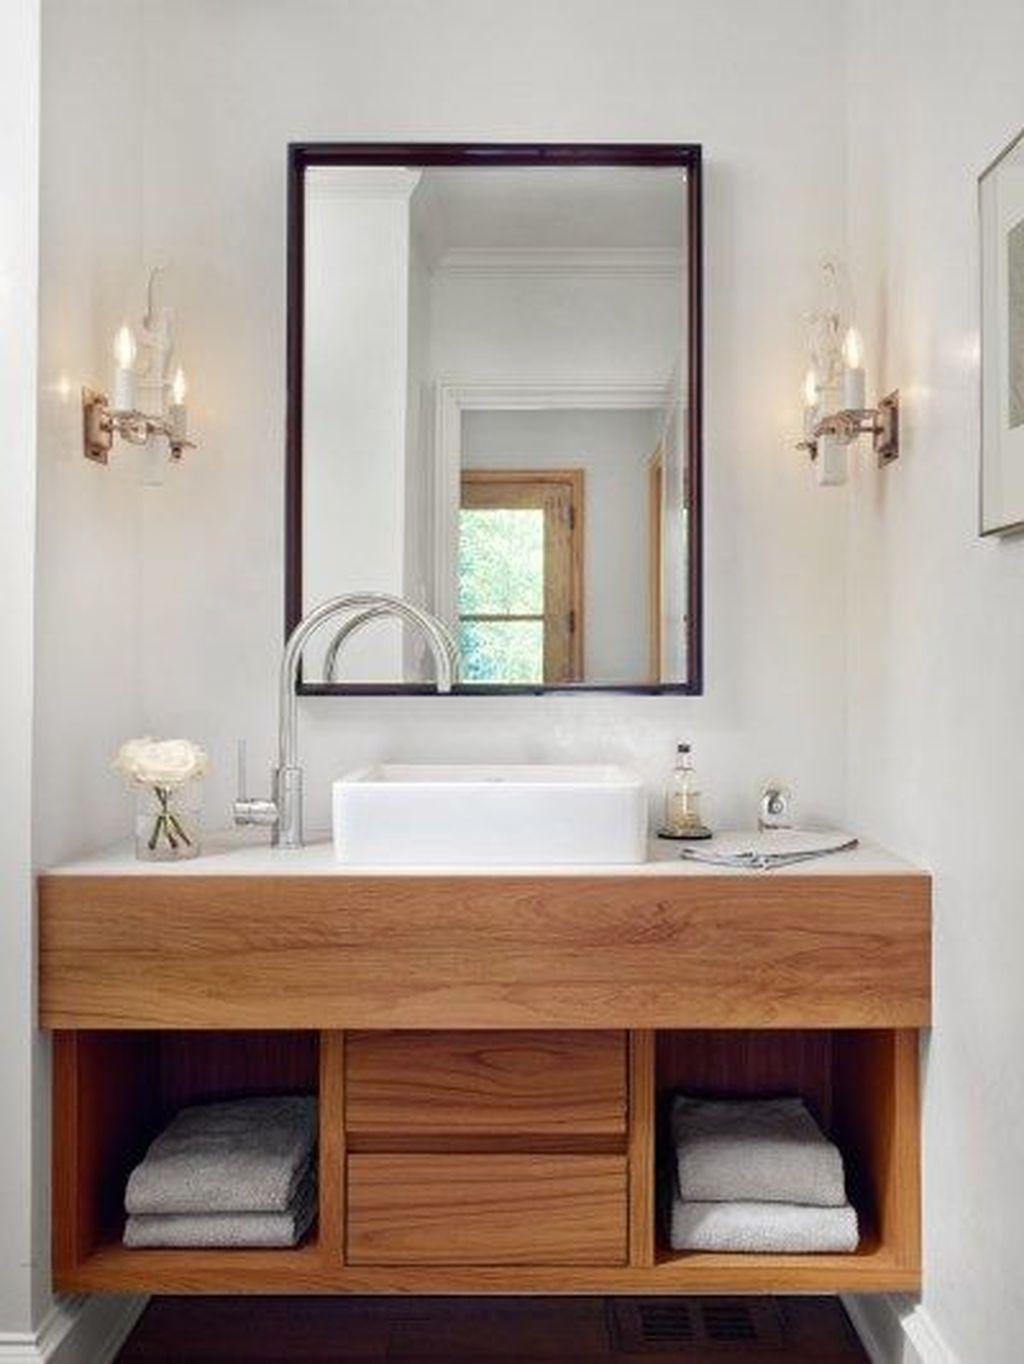 Impressive 30 Cozy Bathroom Makeover Ideas Modern Bathroom Vanity Home Depot Bathroom Vanity Home Depot Bathroom